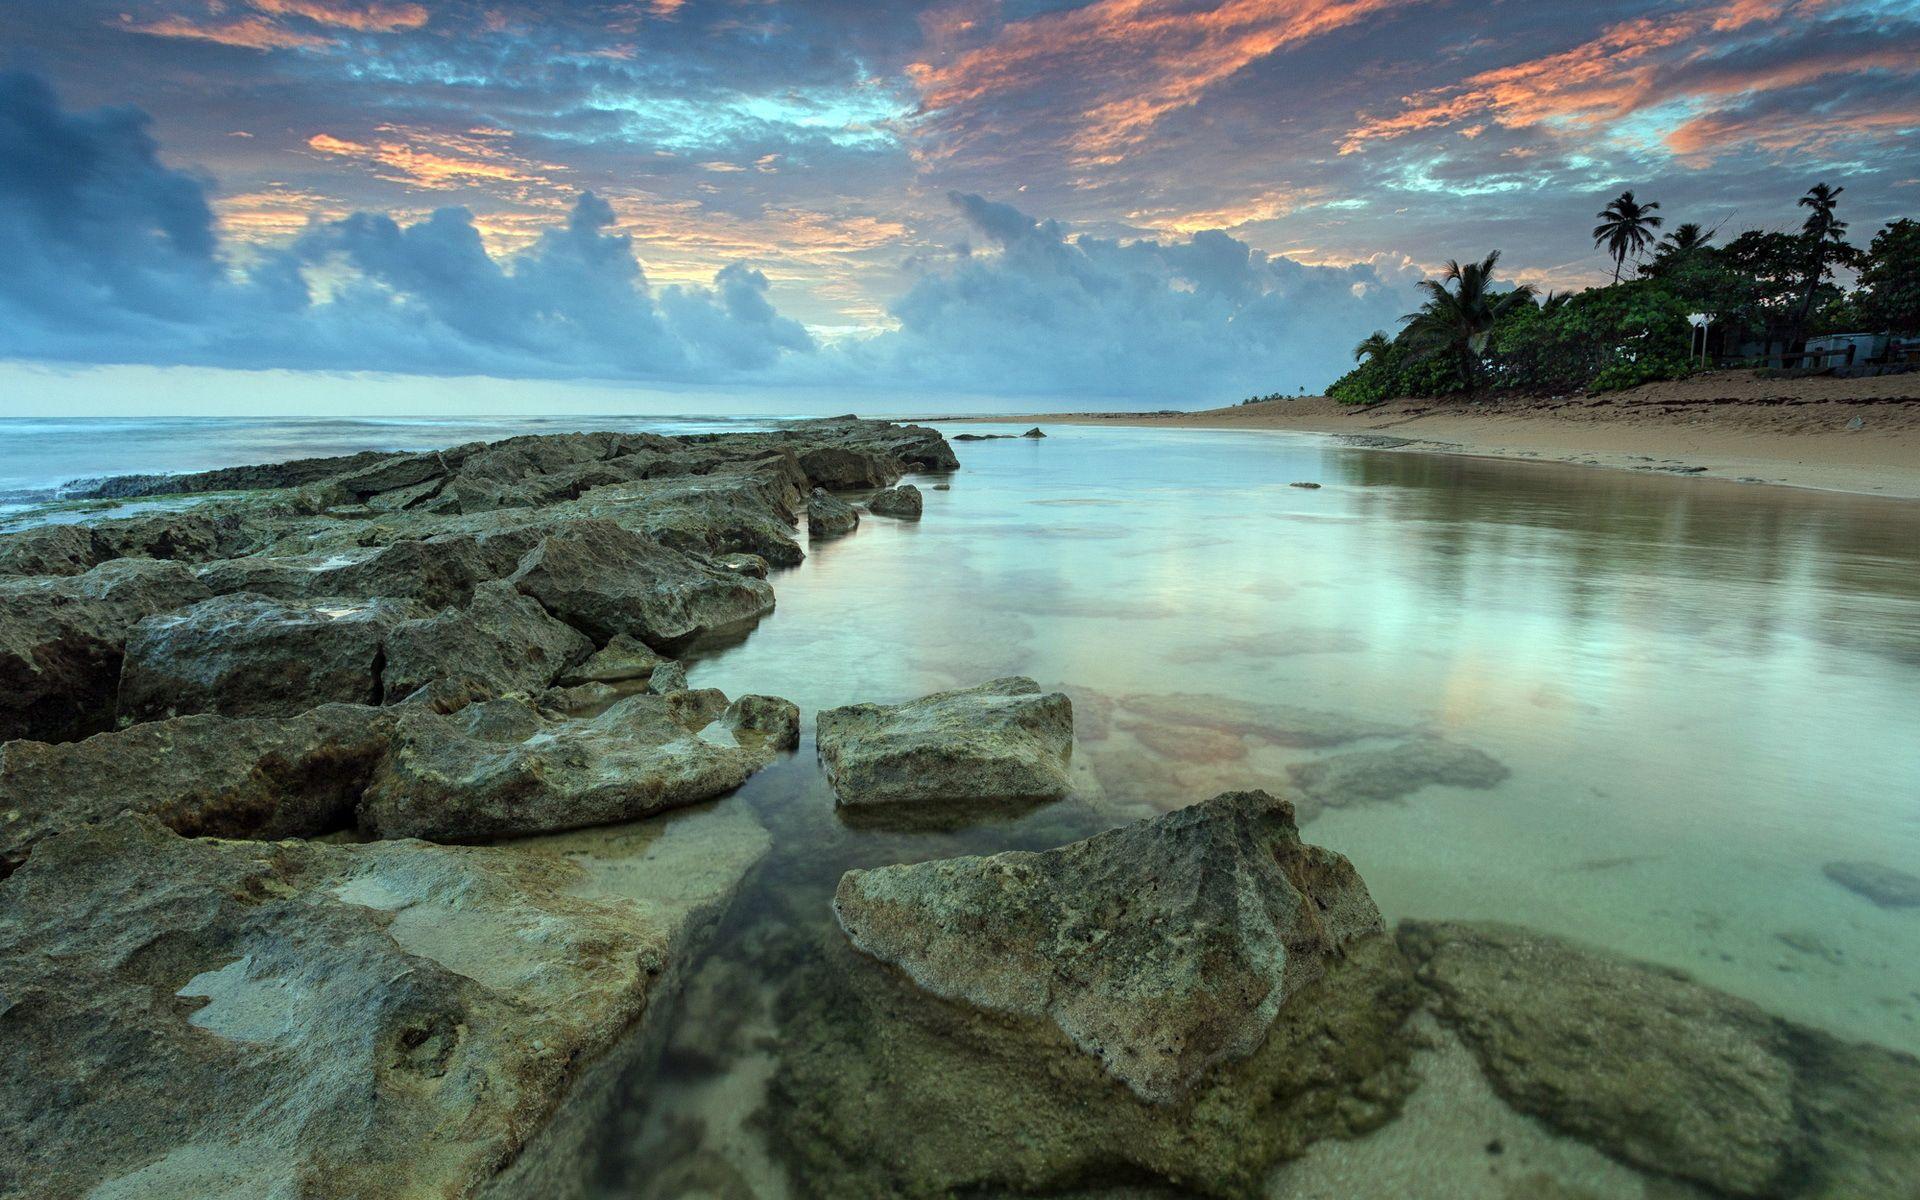 Beach Rocks Landscape Wonders Hd Nature Wallpapers